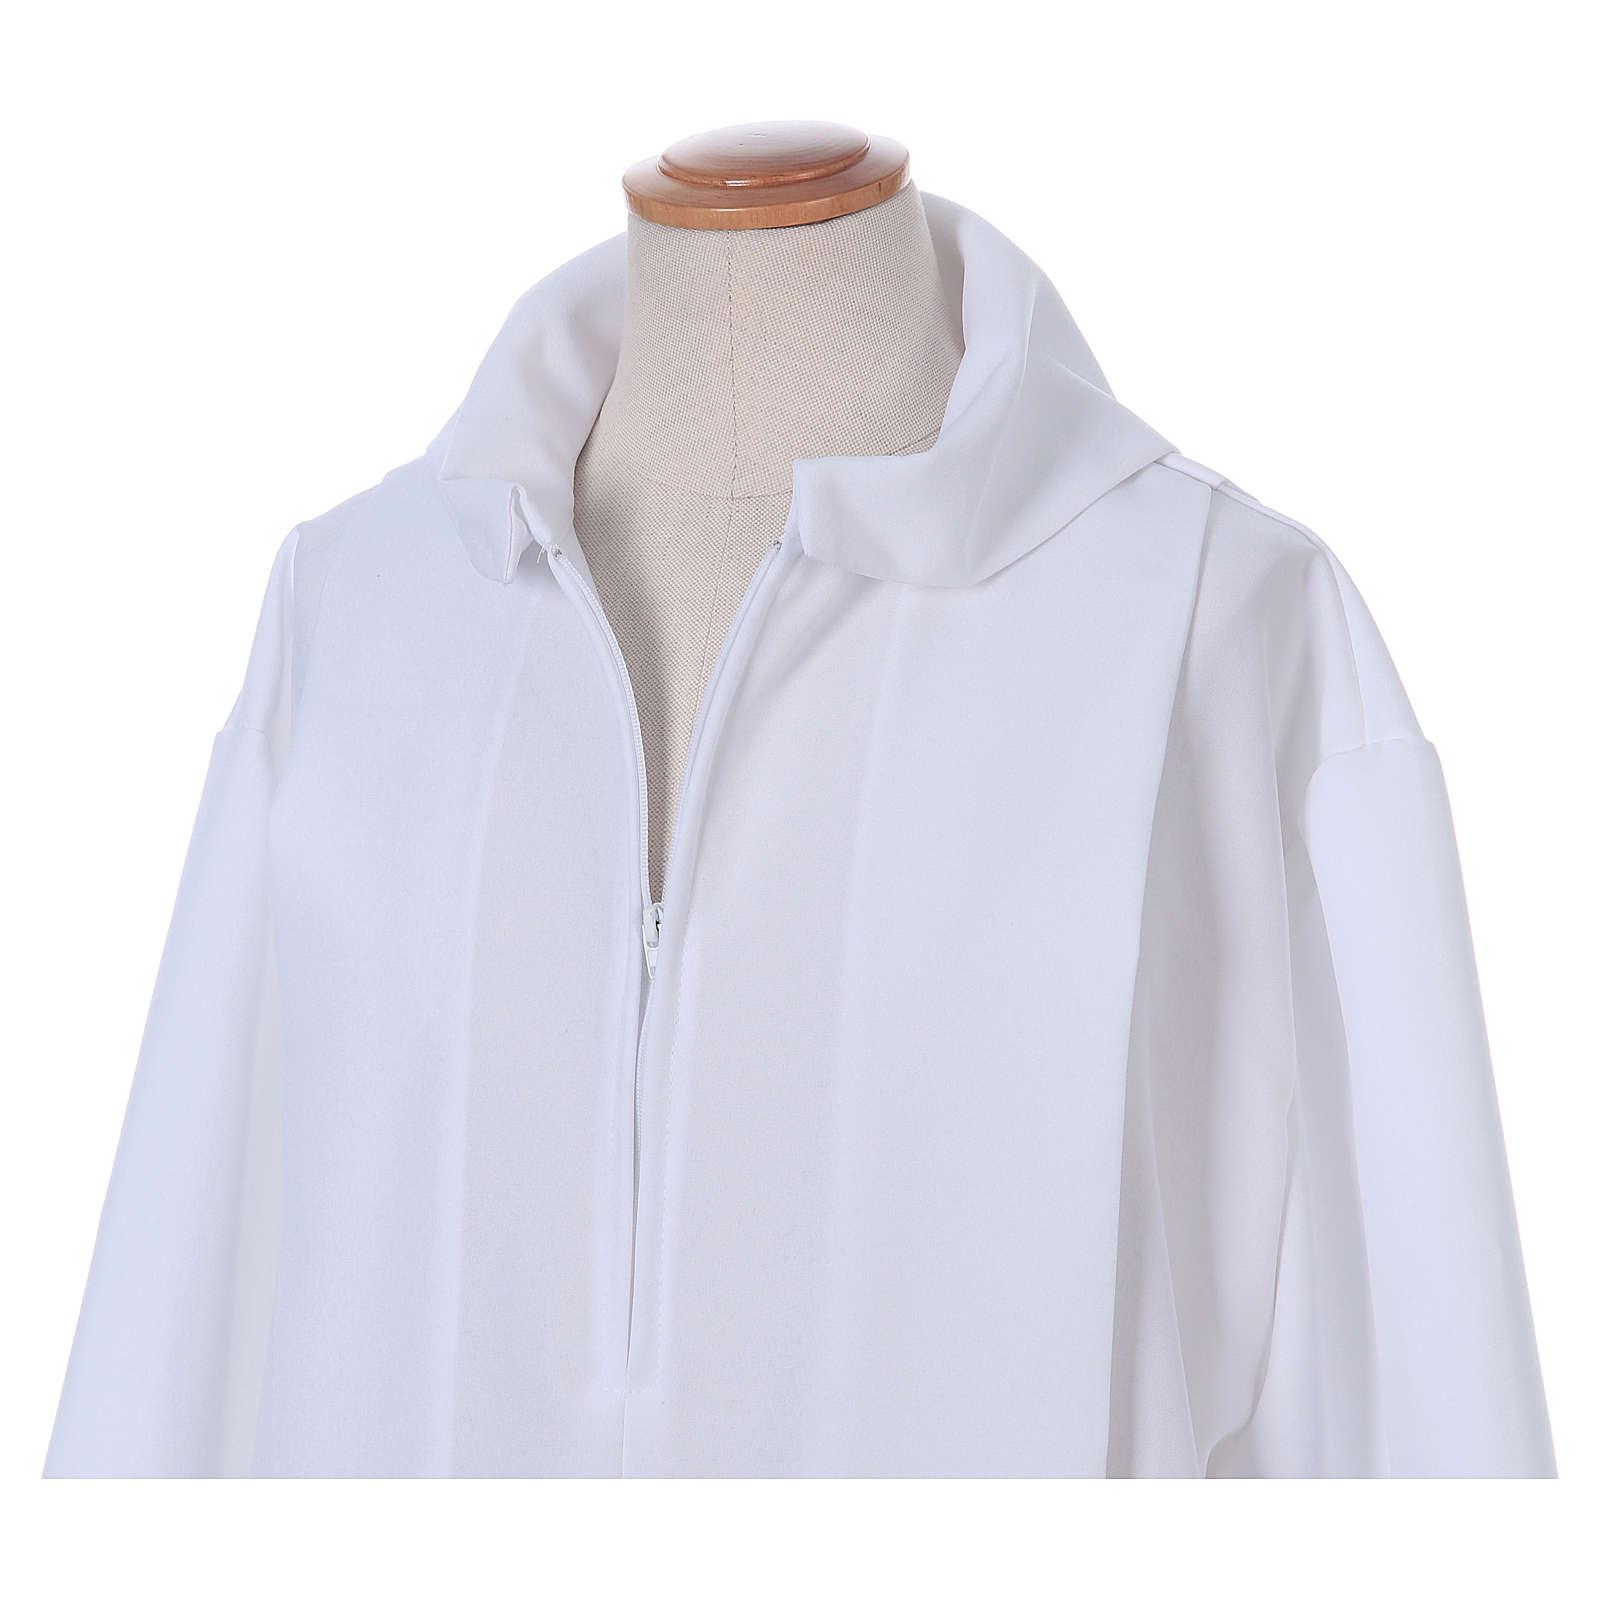 Vestido Primera Comunión poliéster dos pliegues falsa capucha 4